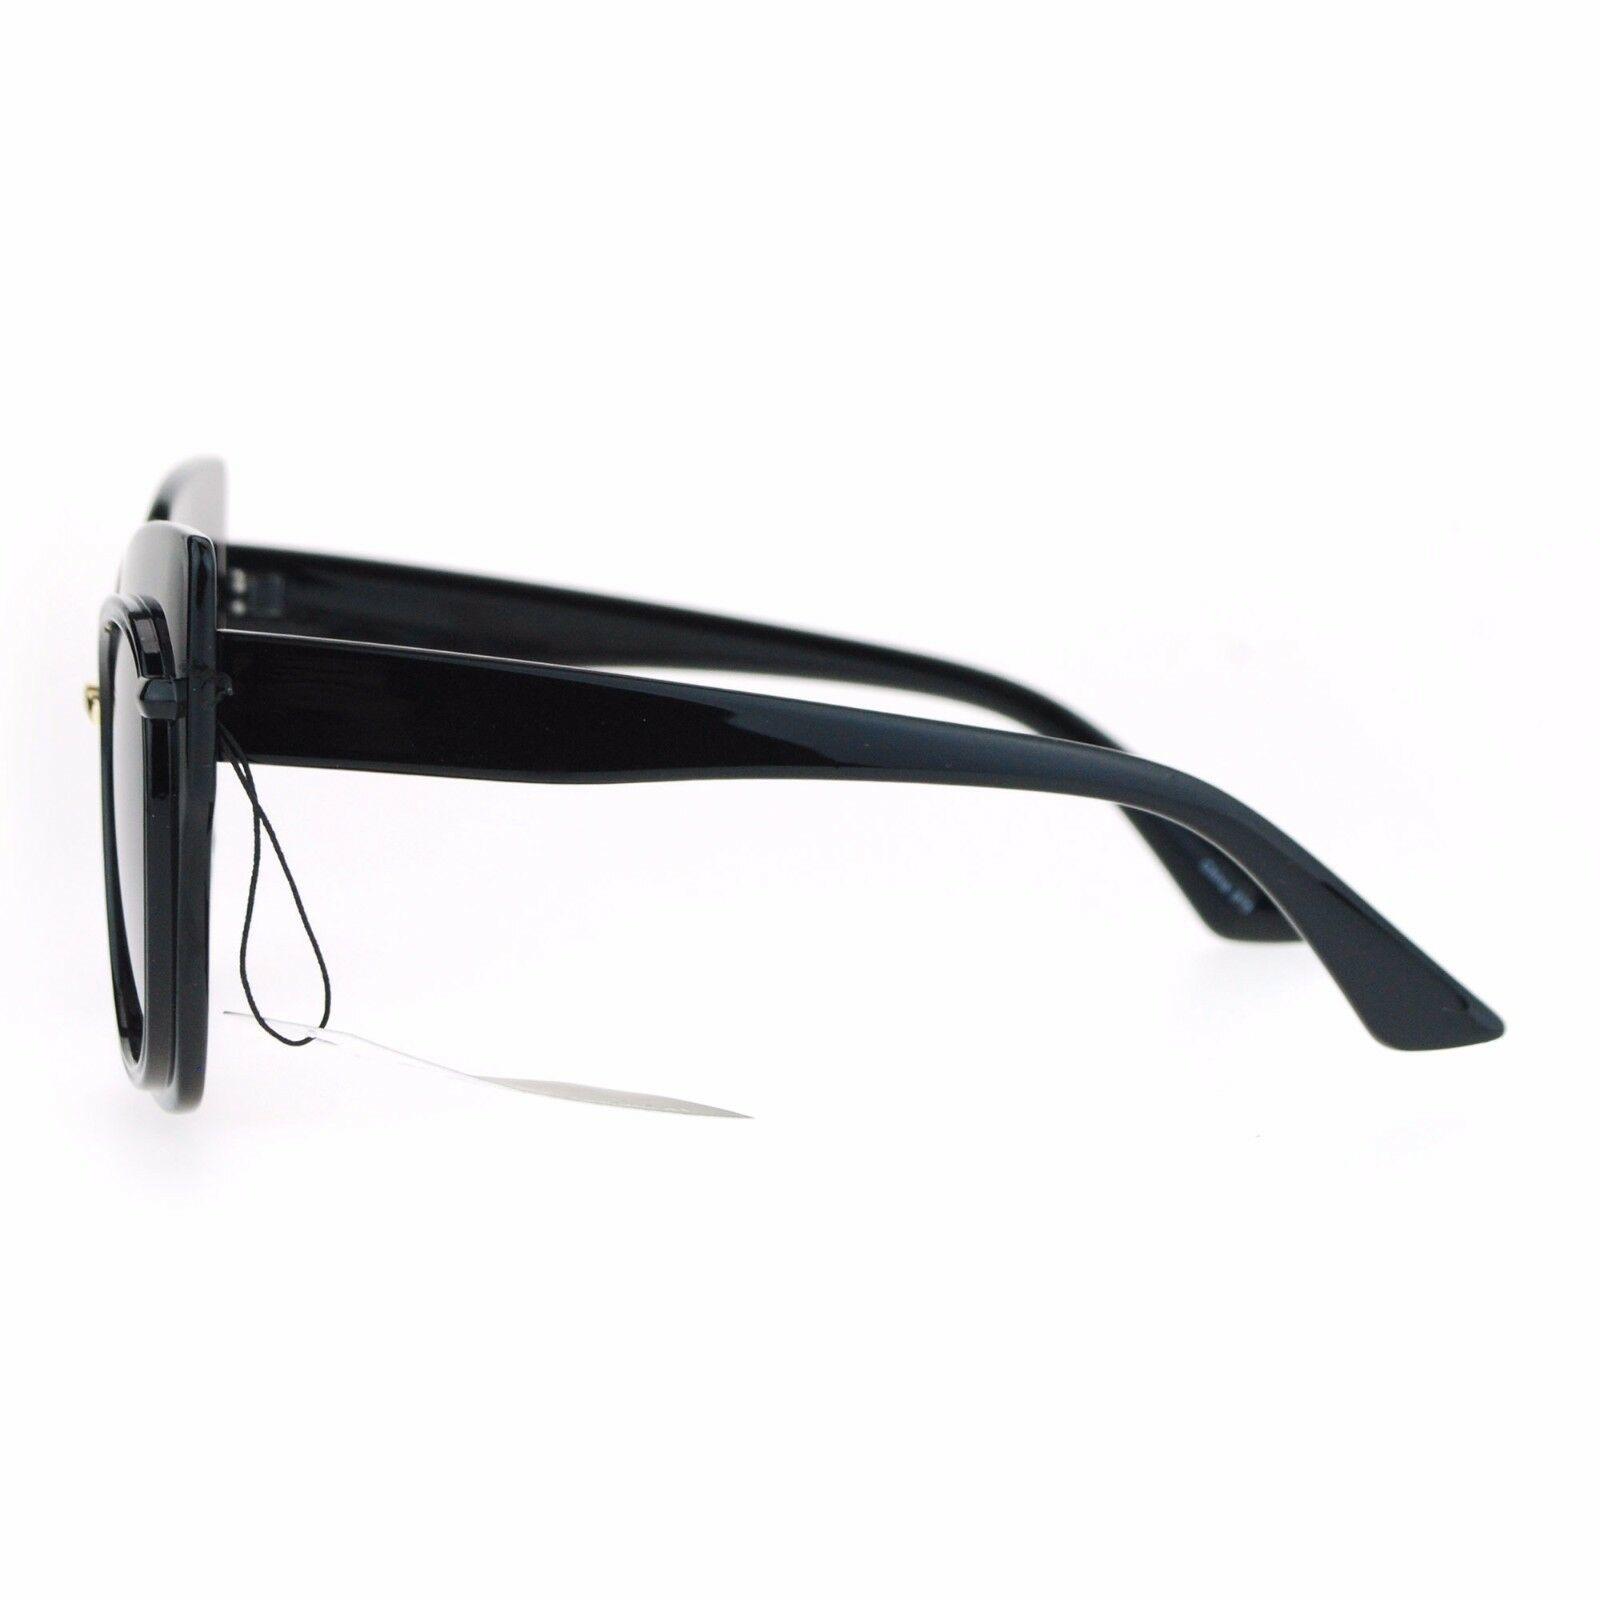 Oversized Fashion Sunglasses Womens Square Cateye Butterfly UV 400 image 8